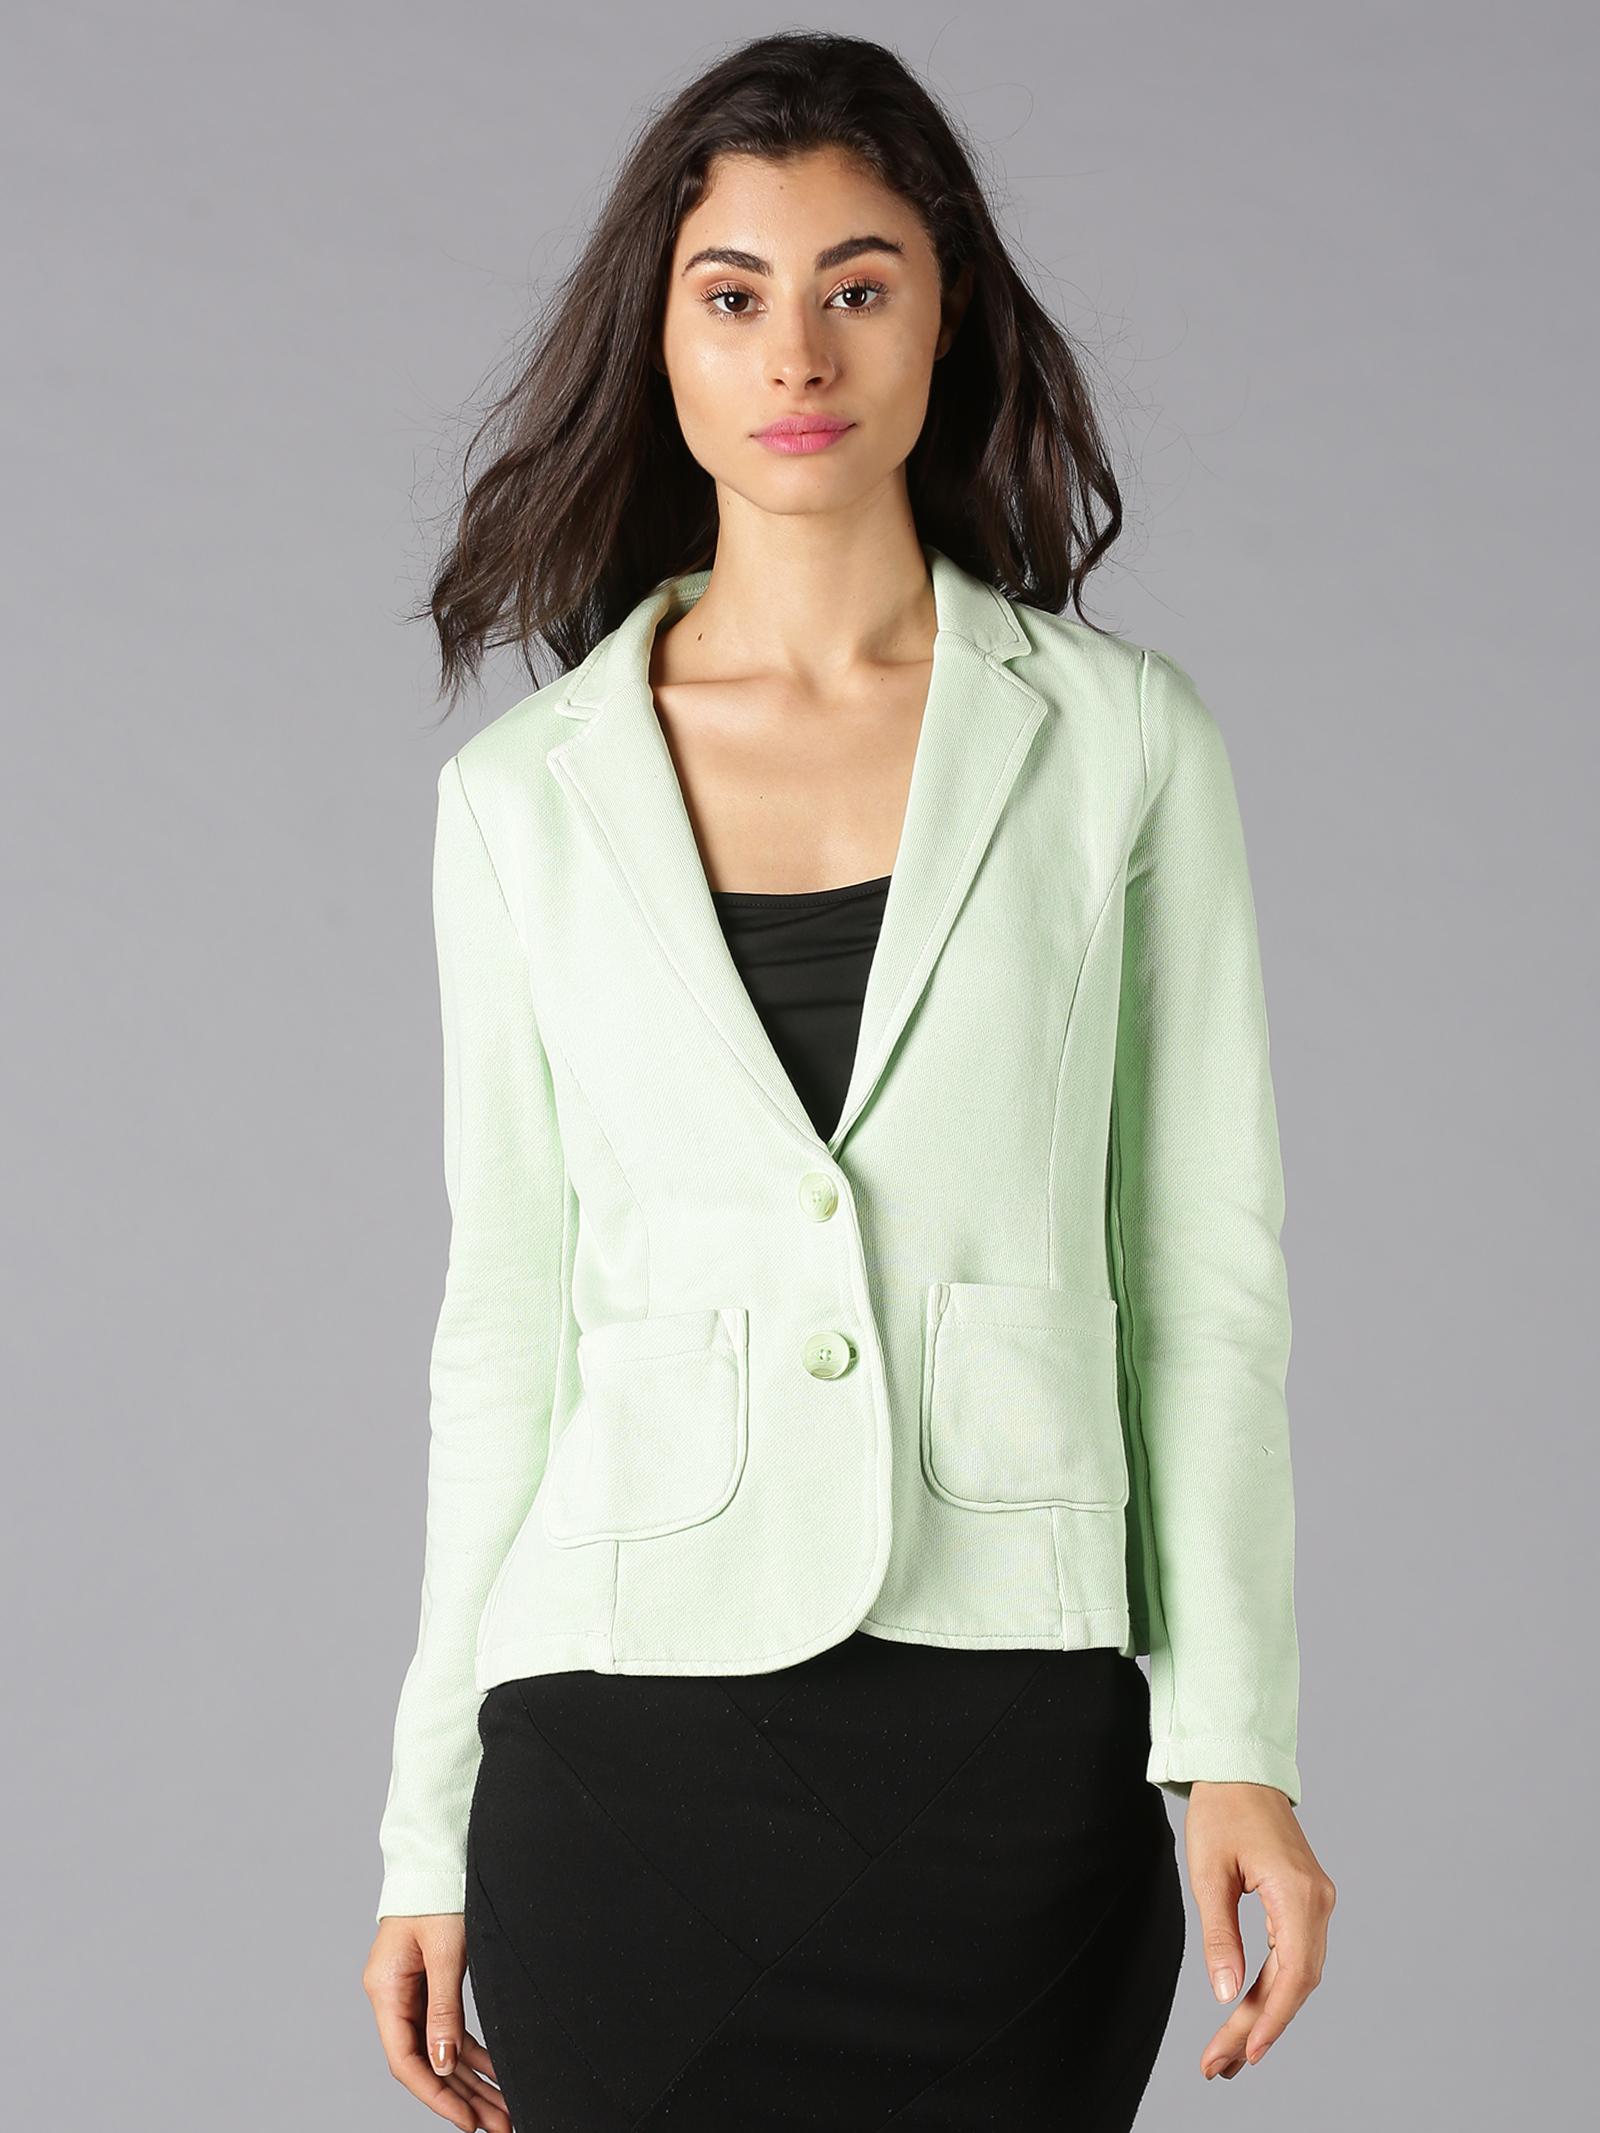 UrGear   UrGear 100%Cotton Solid Coat